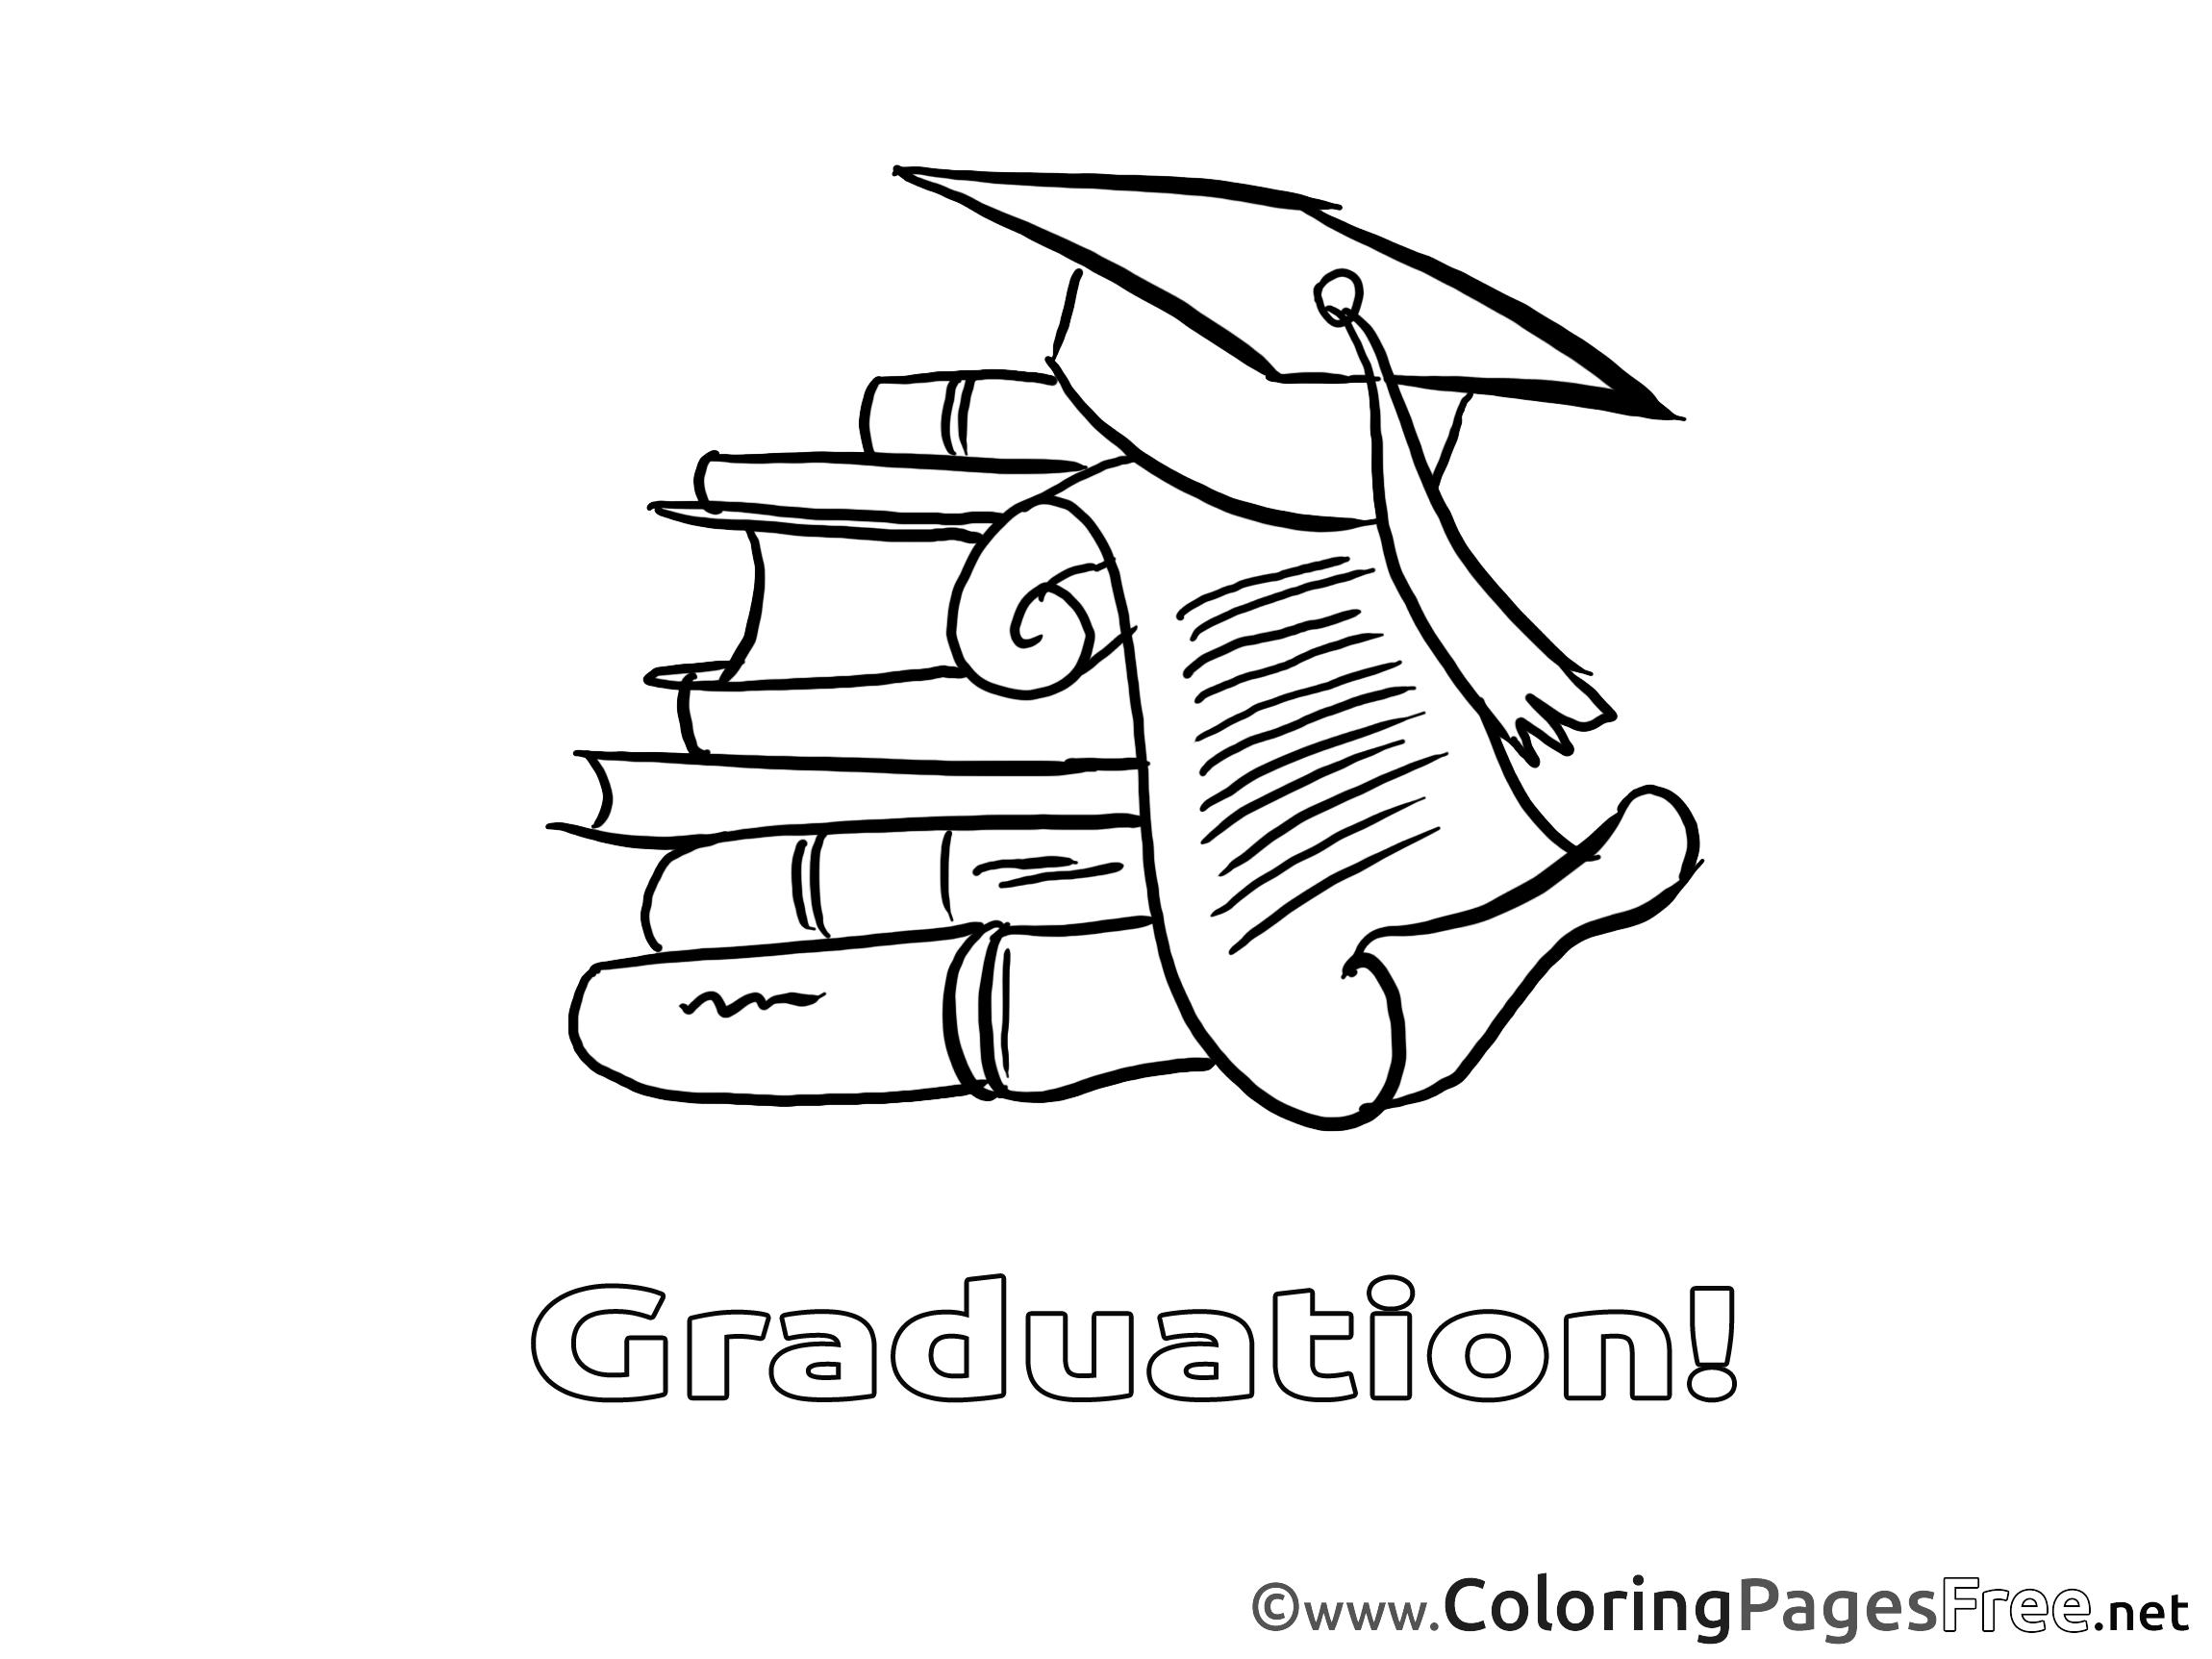 Coloring pages graduation - Coloring Pages Graduation 32